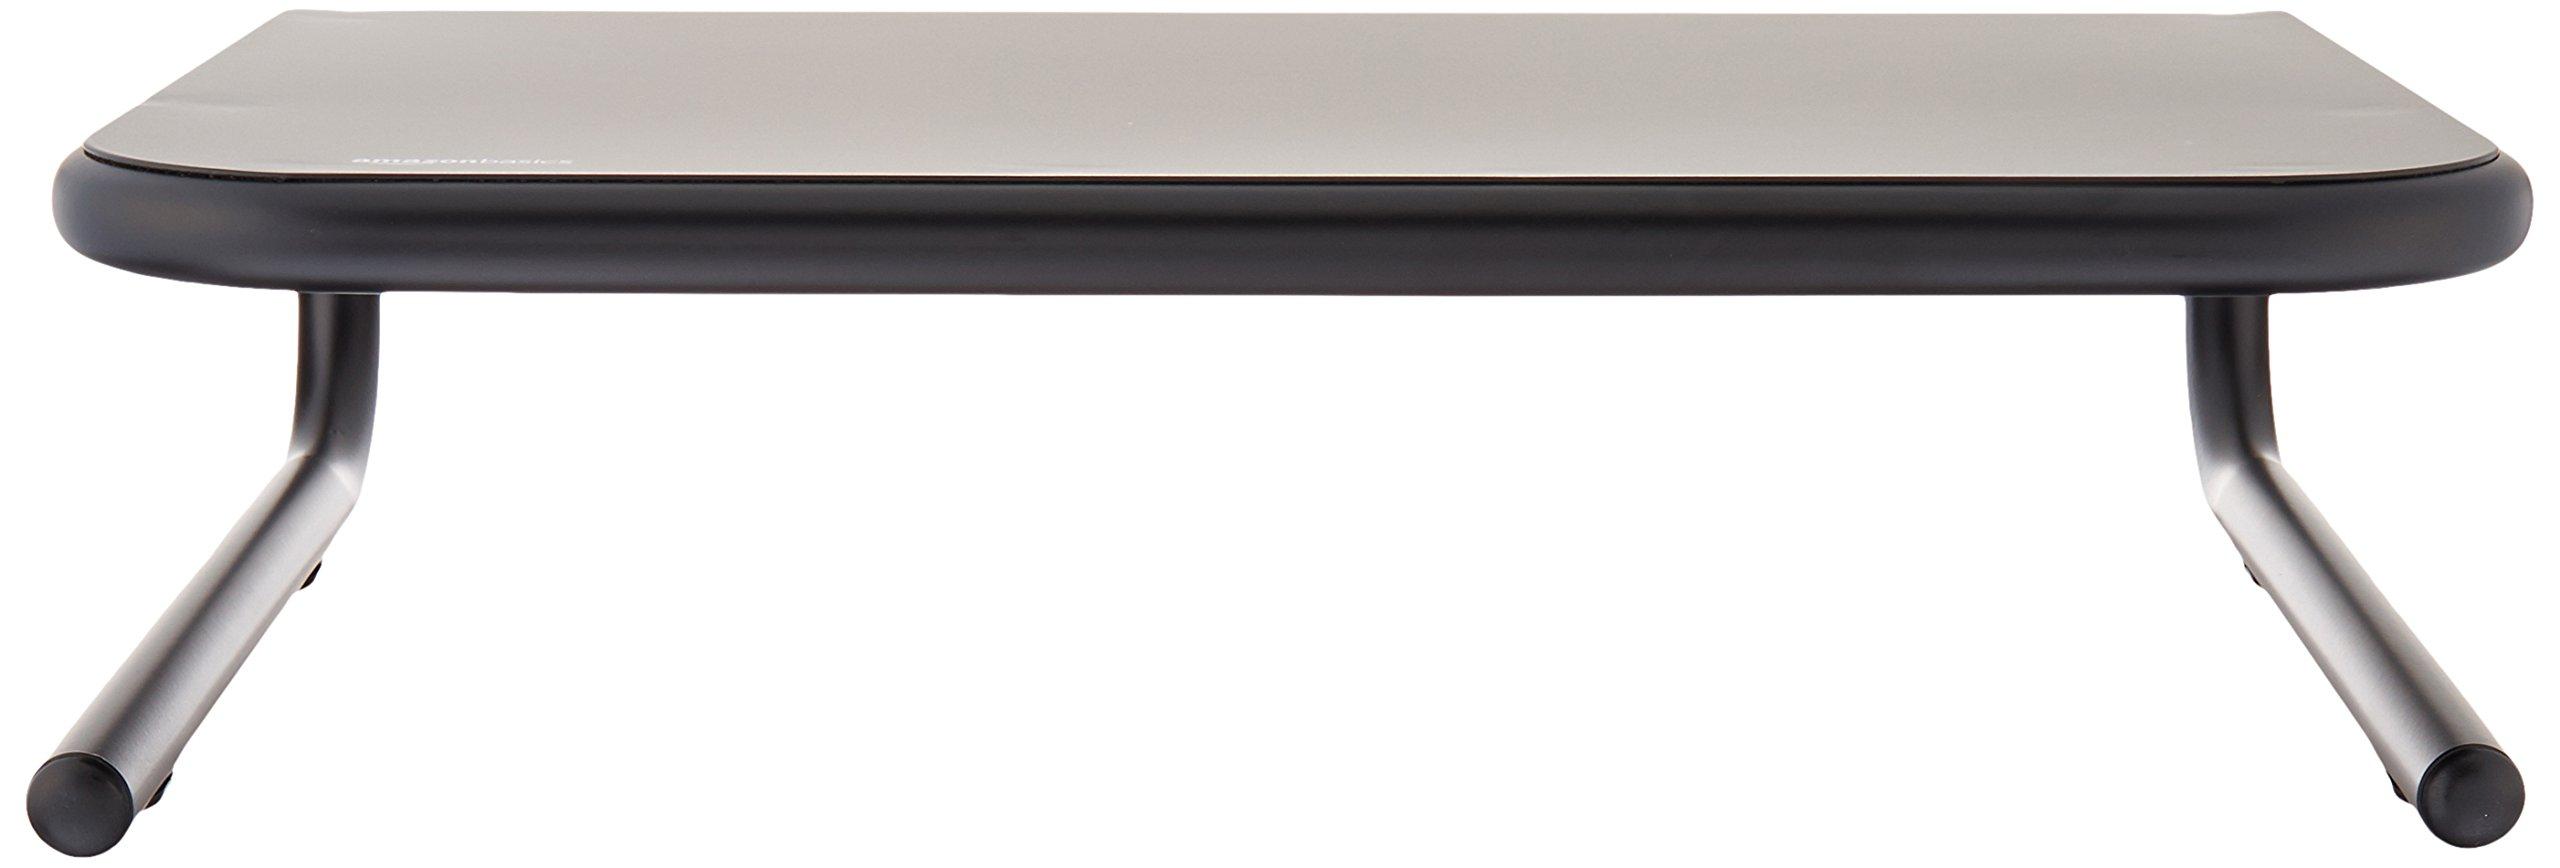 AmazonBasics Metal Monitor Stand - Black by AmazonBasics (Image #5)